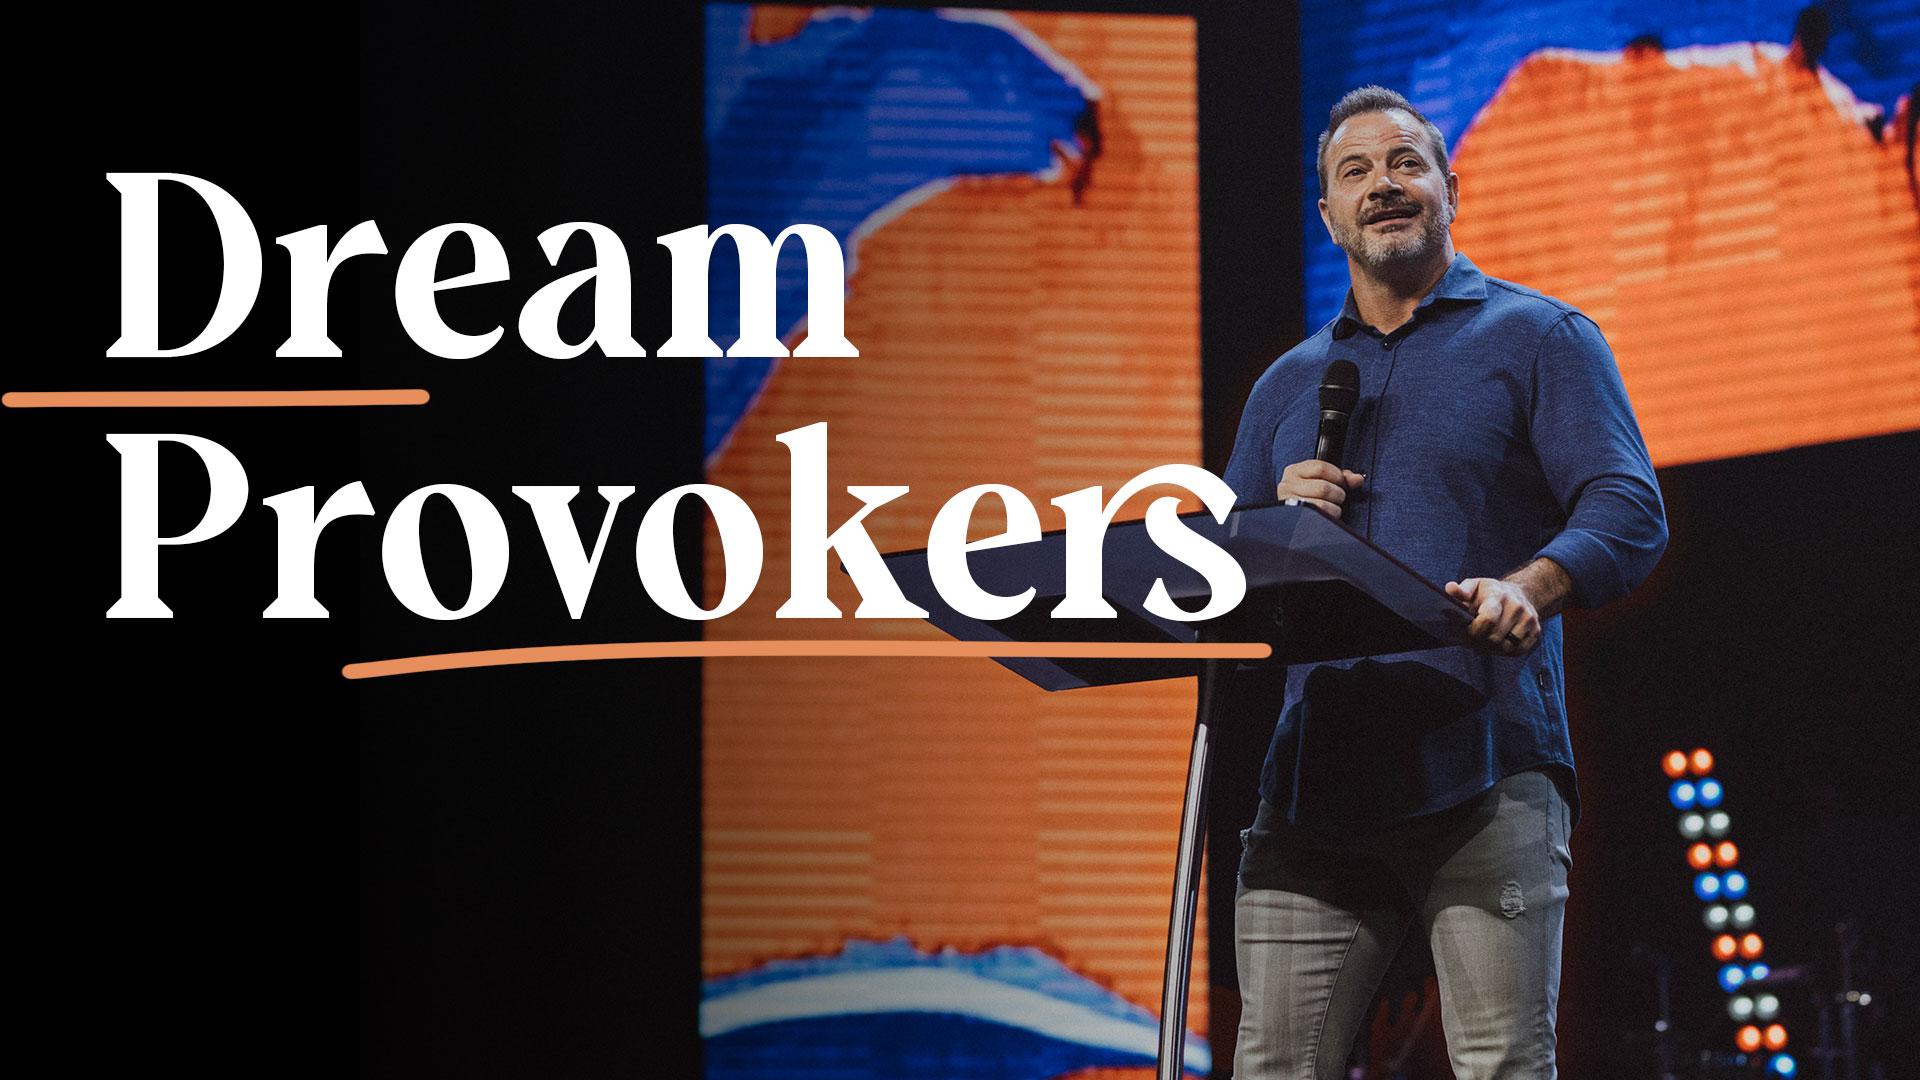 Dream Provokers